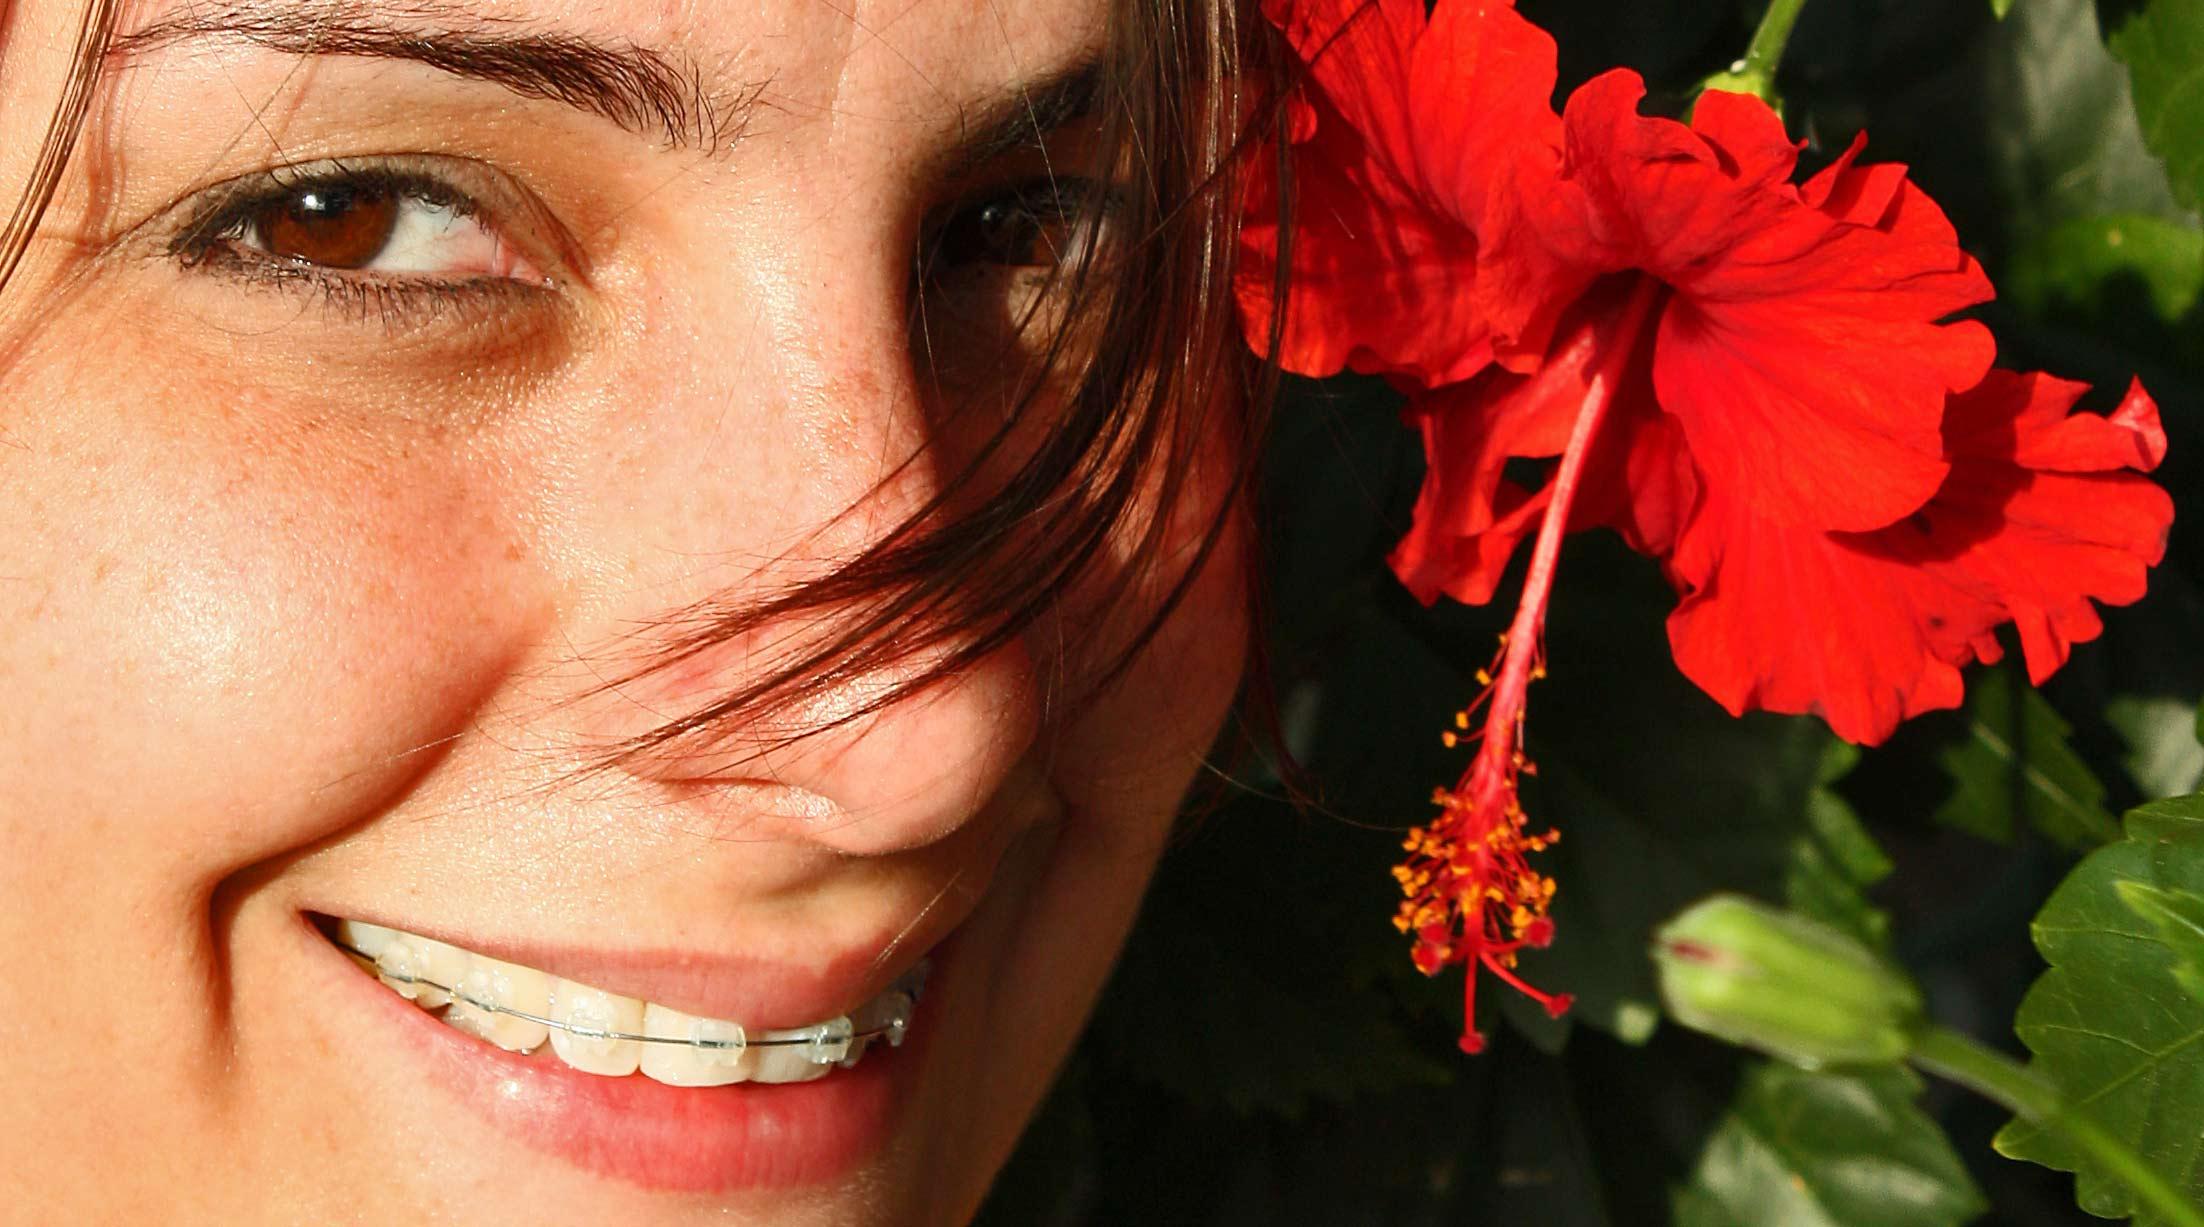 braces-flower-smile